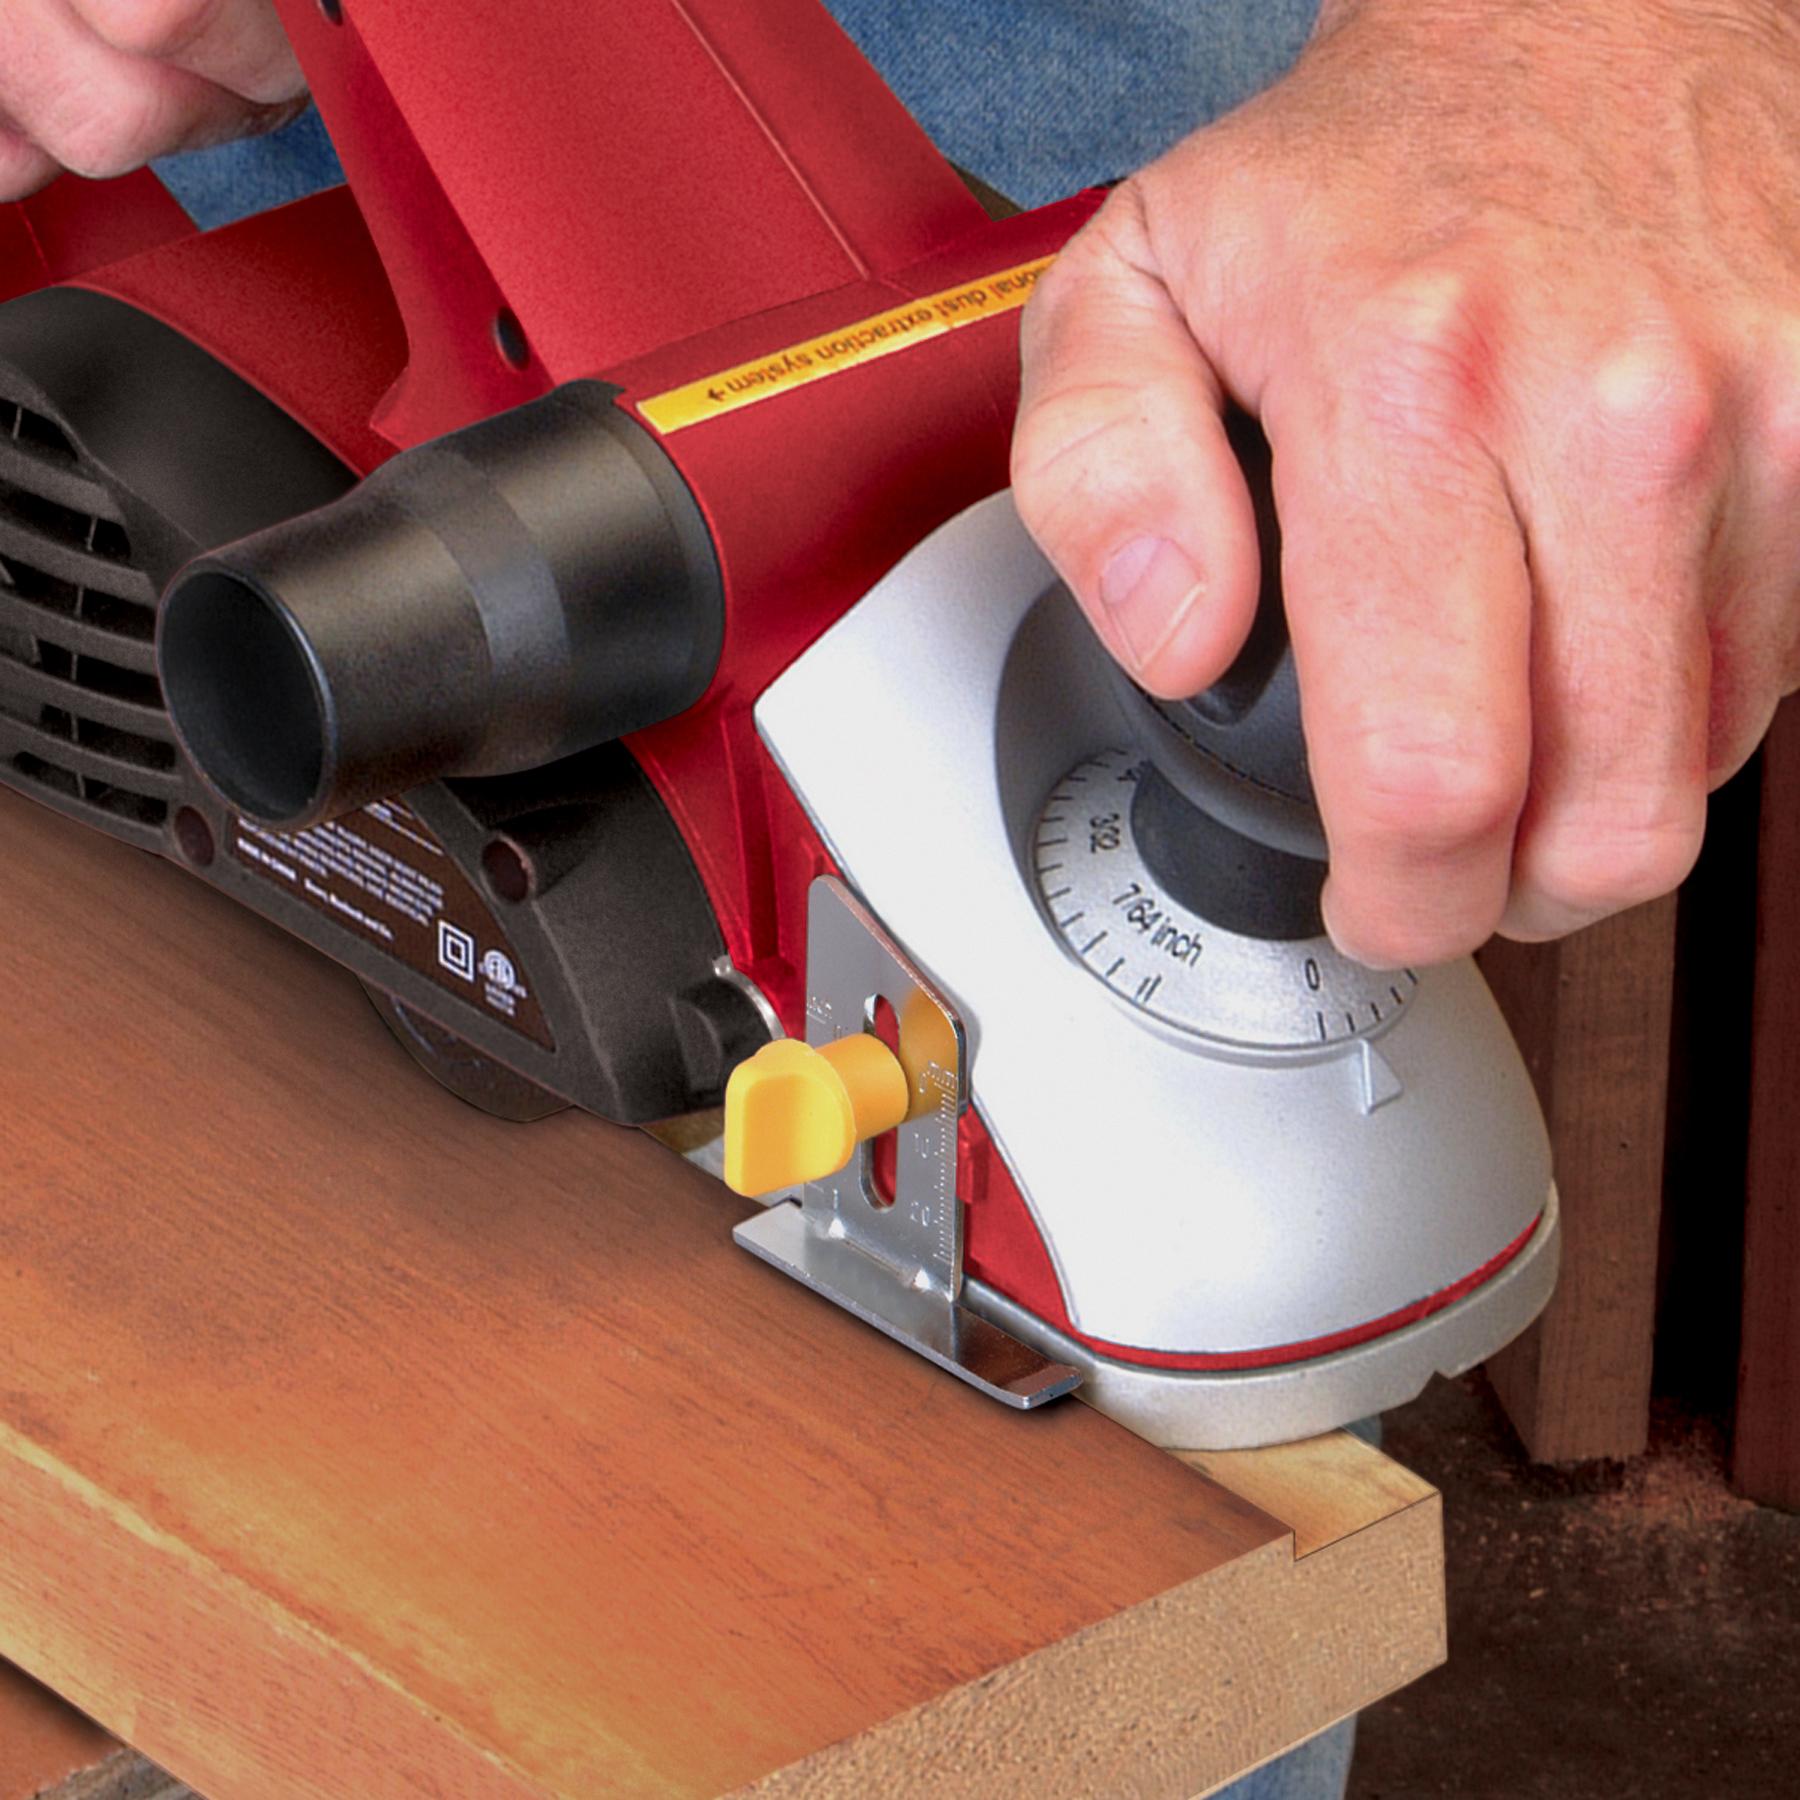 "Craftsman Professional 26729 7 amp Corded 3-1/4"" Planer"